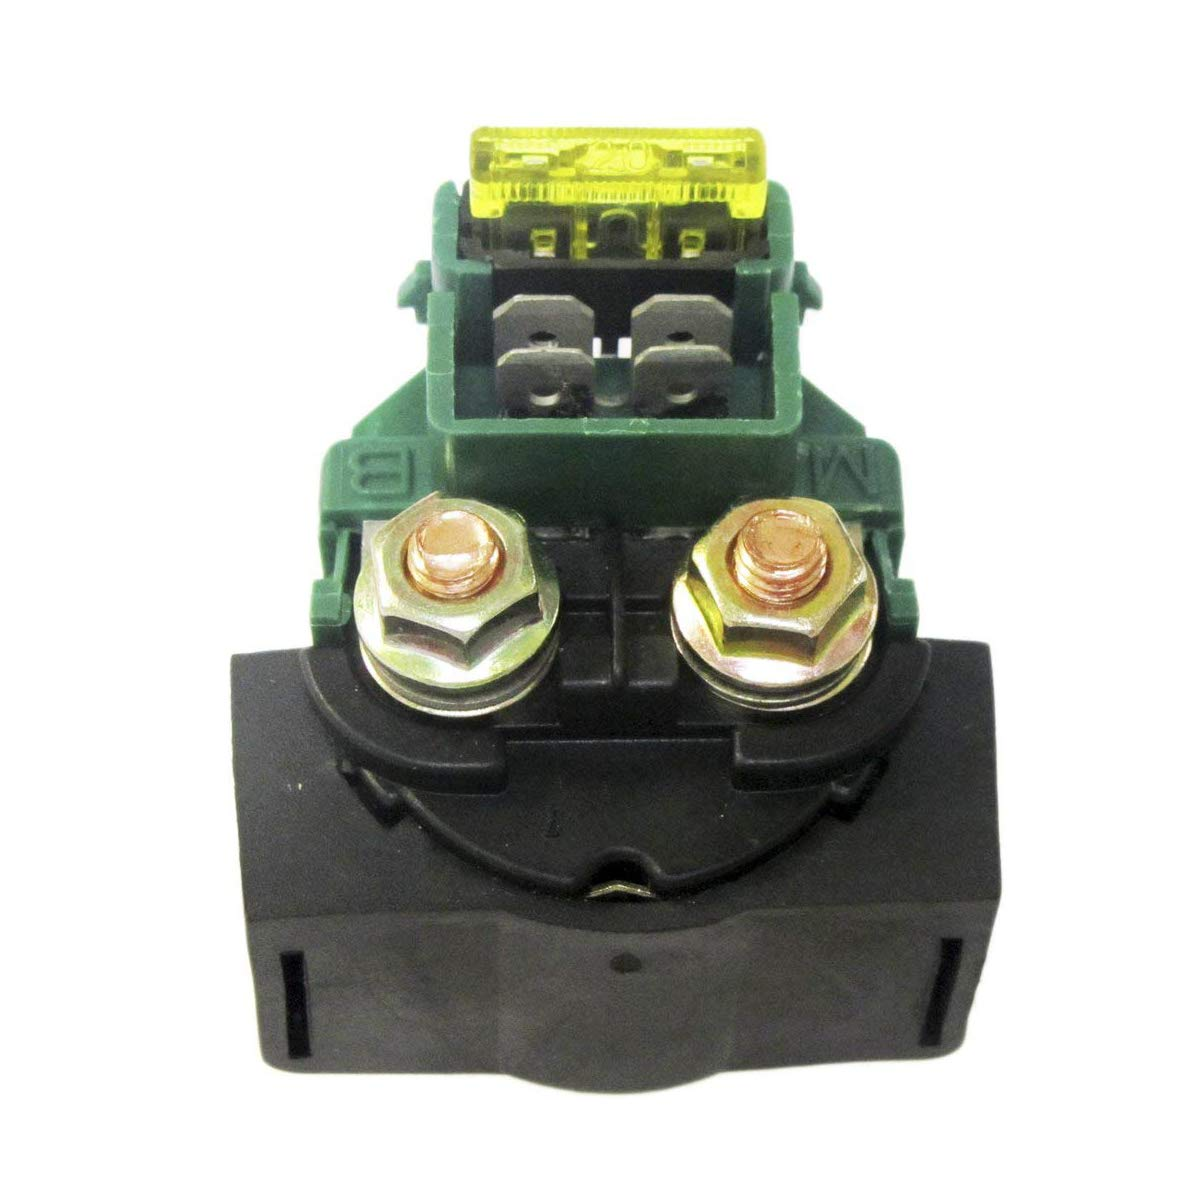 AUTVAN Starter Relay Solenoid for Kawasaki KLX650 1993-1996 Bayou 220 KLF220 1988-2002 Bayou 250 KLF250 2003-2010#27010-1243 27010-1283 ATV New